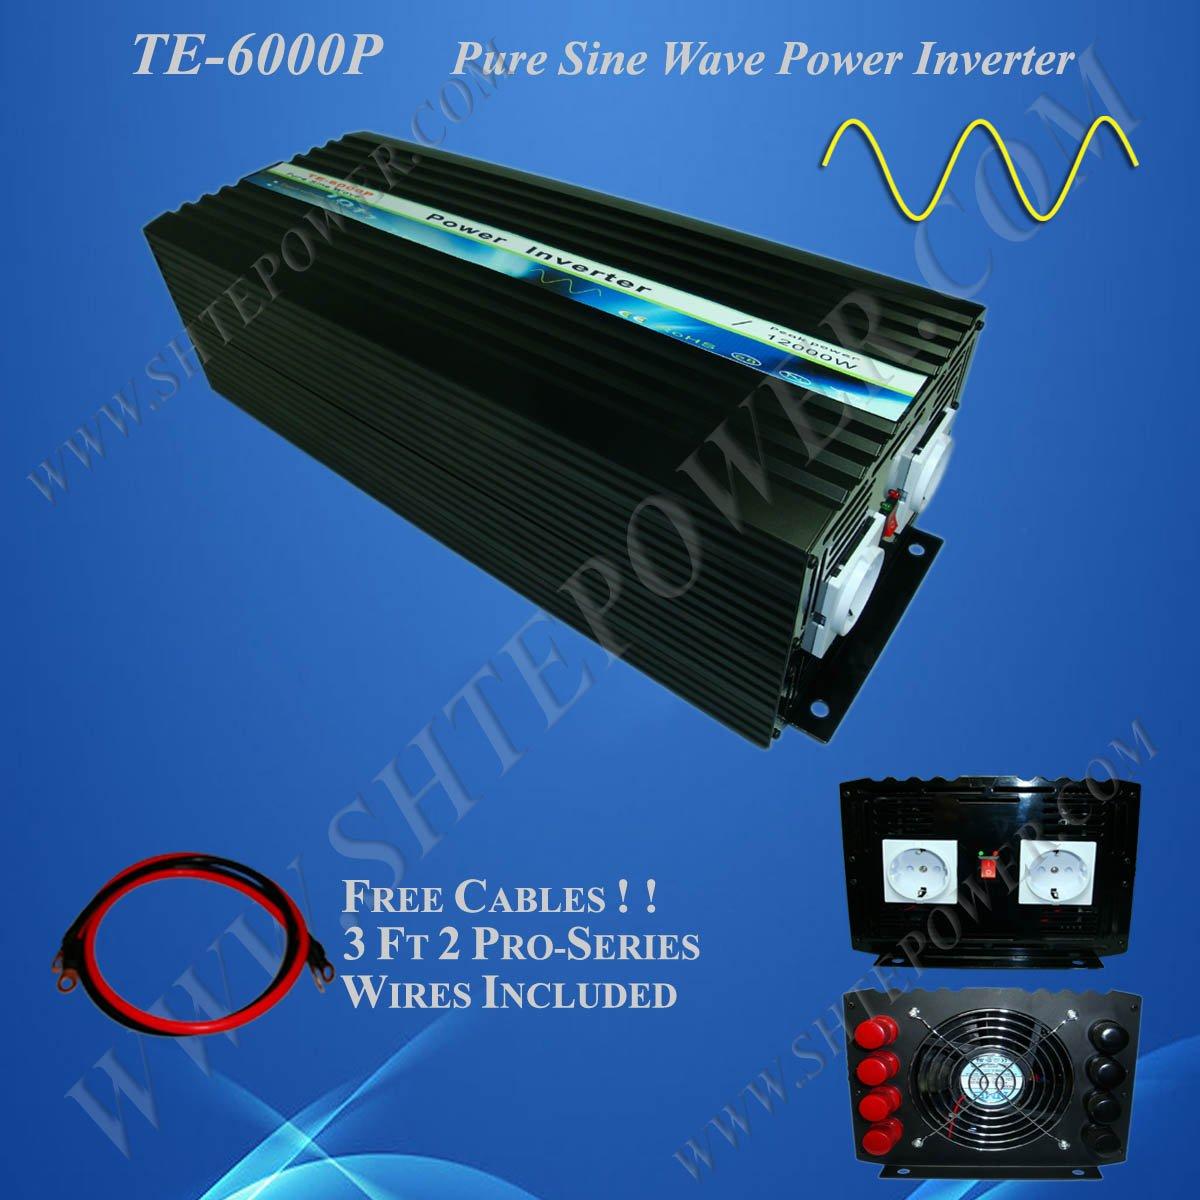 dc 12v to ac 220v 6000w pure sine wave power inverter and 60A solar controller 12V/24v auto work 2000w pure sine wave solar power inverter dc 12v 24v 48v to ac 110v 220v